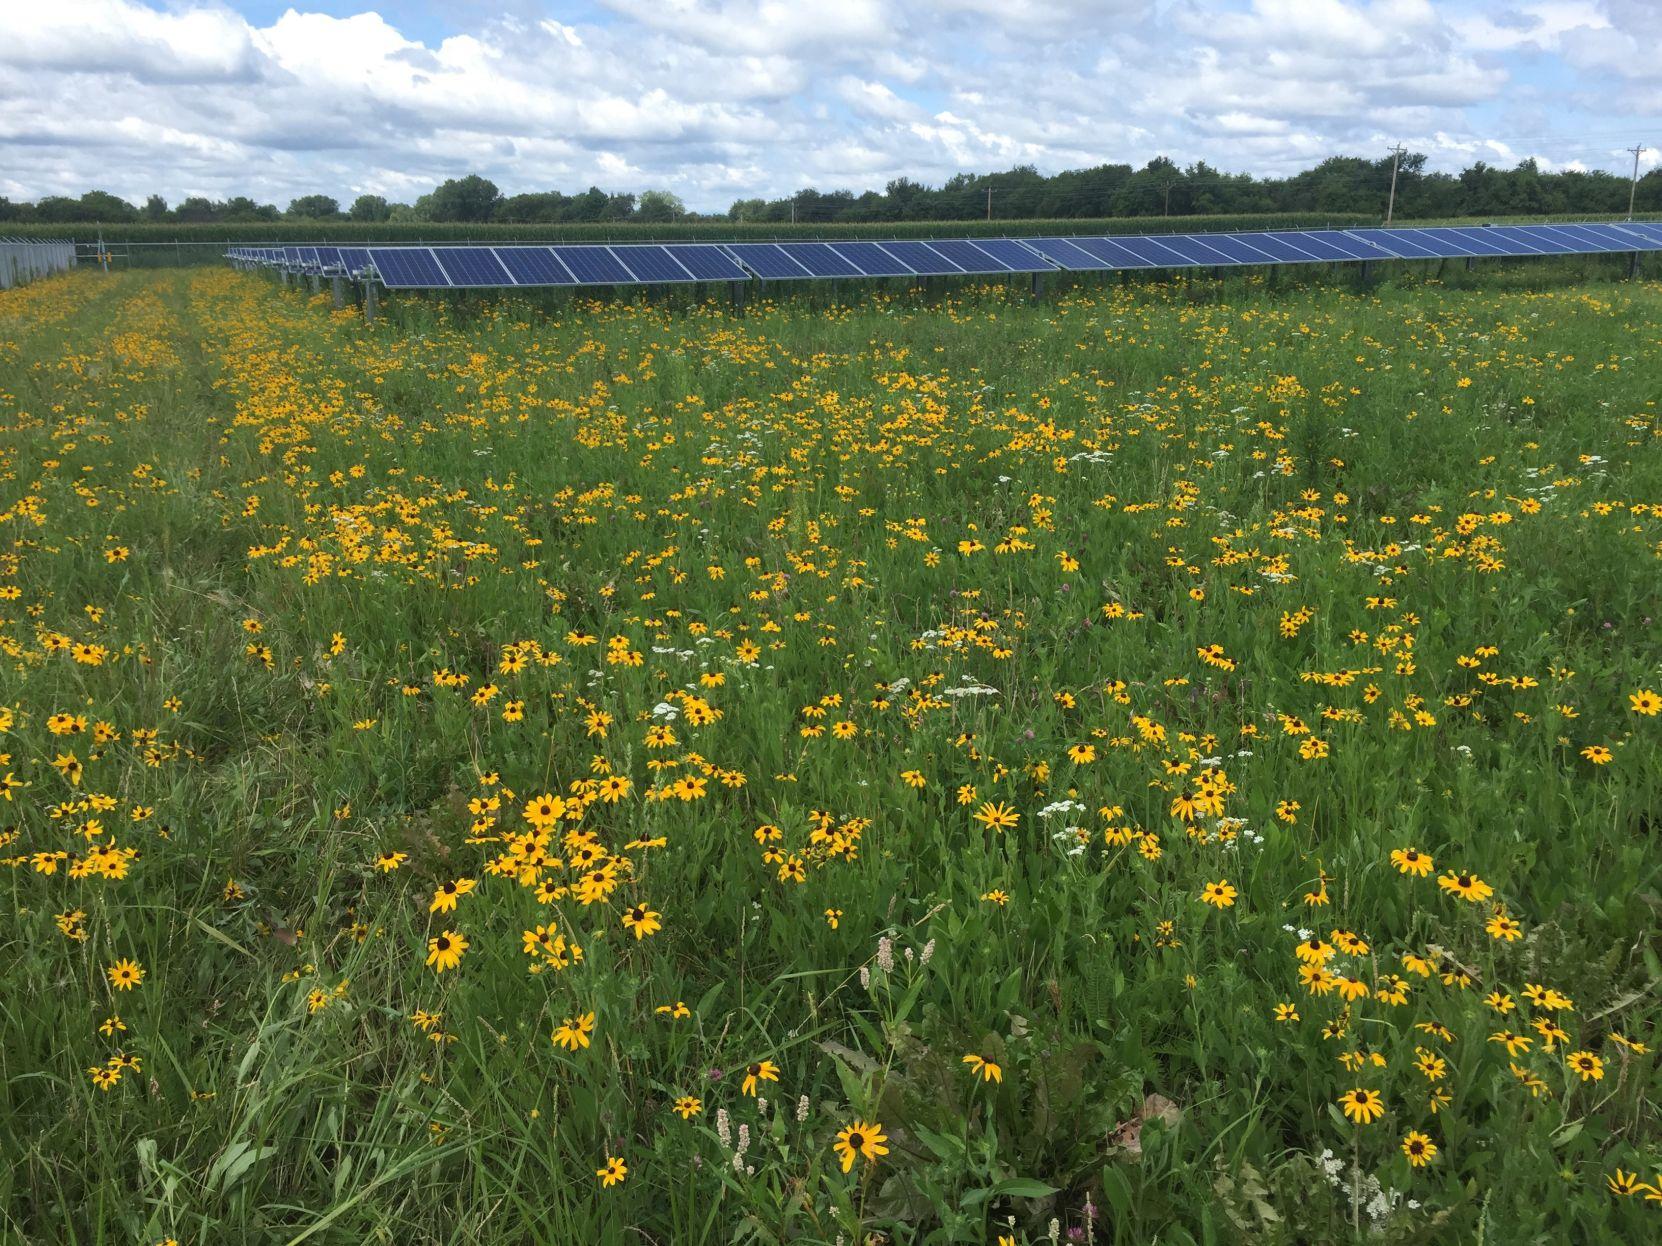 Solar farm with pollinators